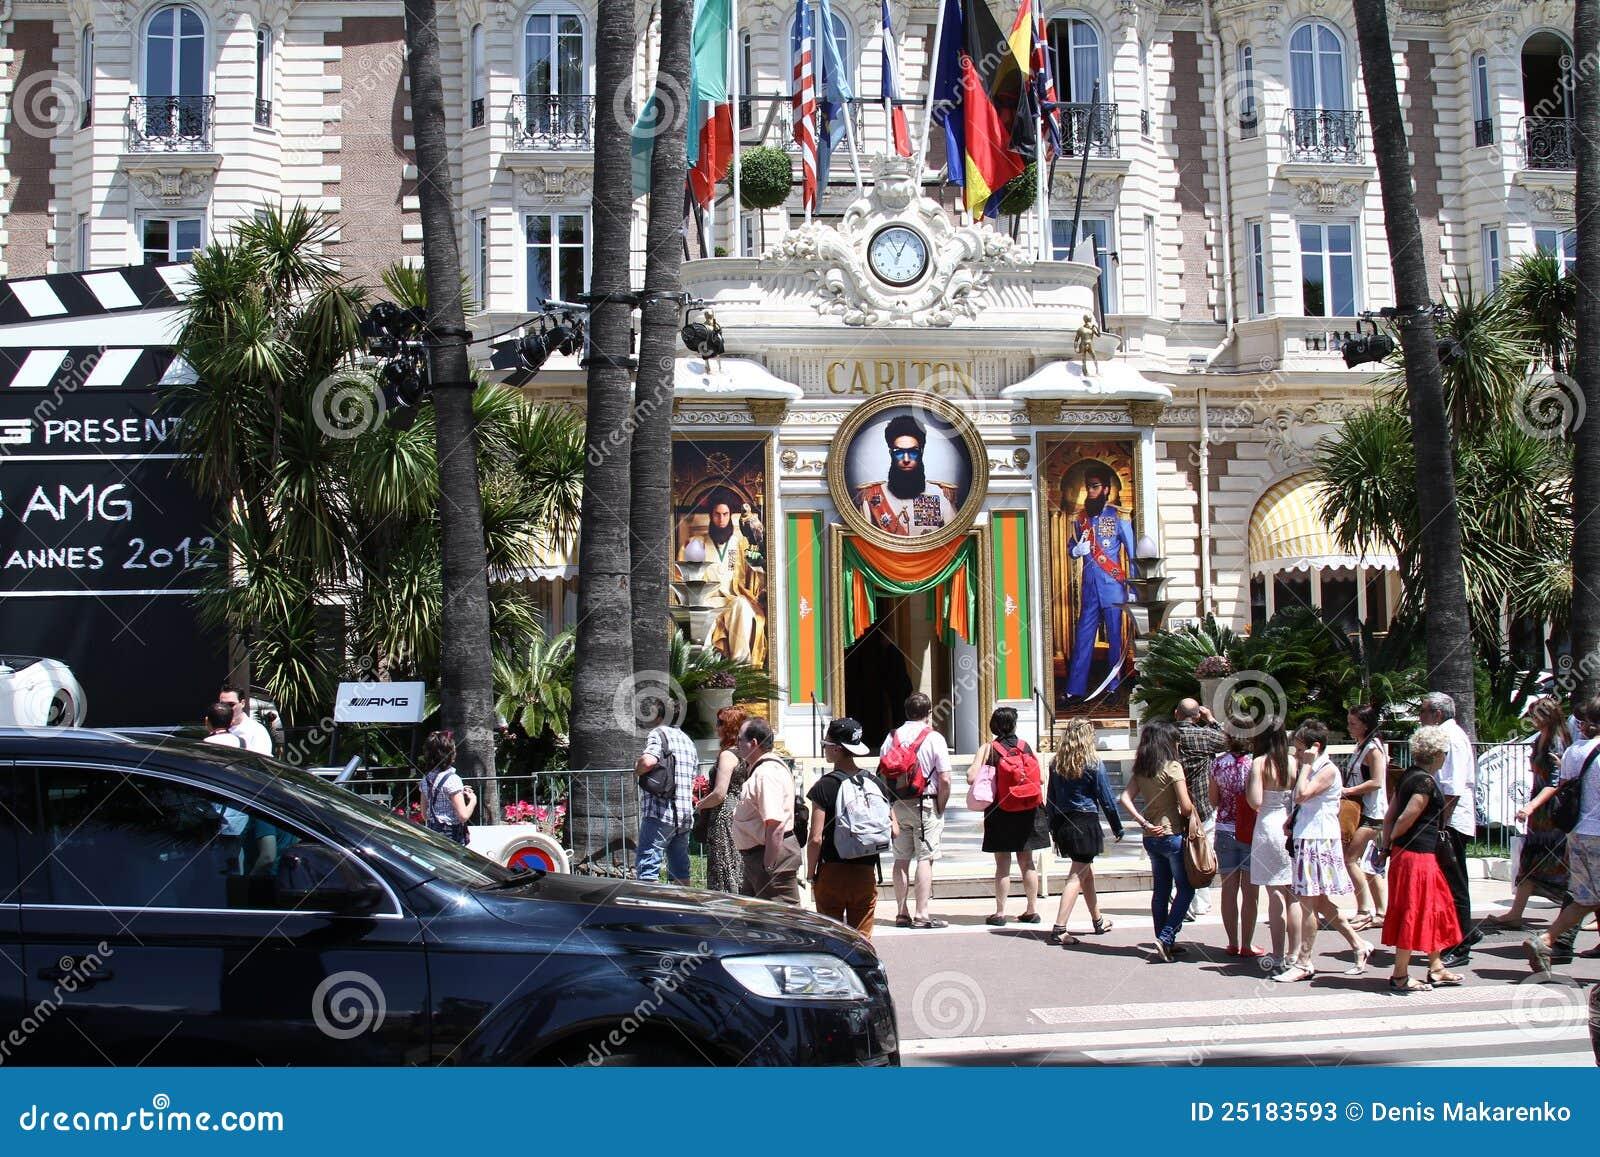 Cannes. Hôtel Carlton